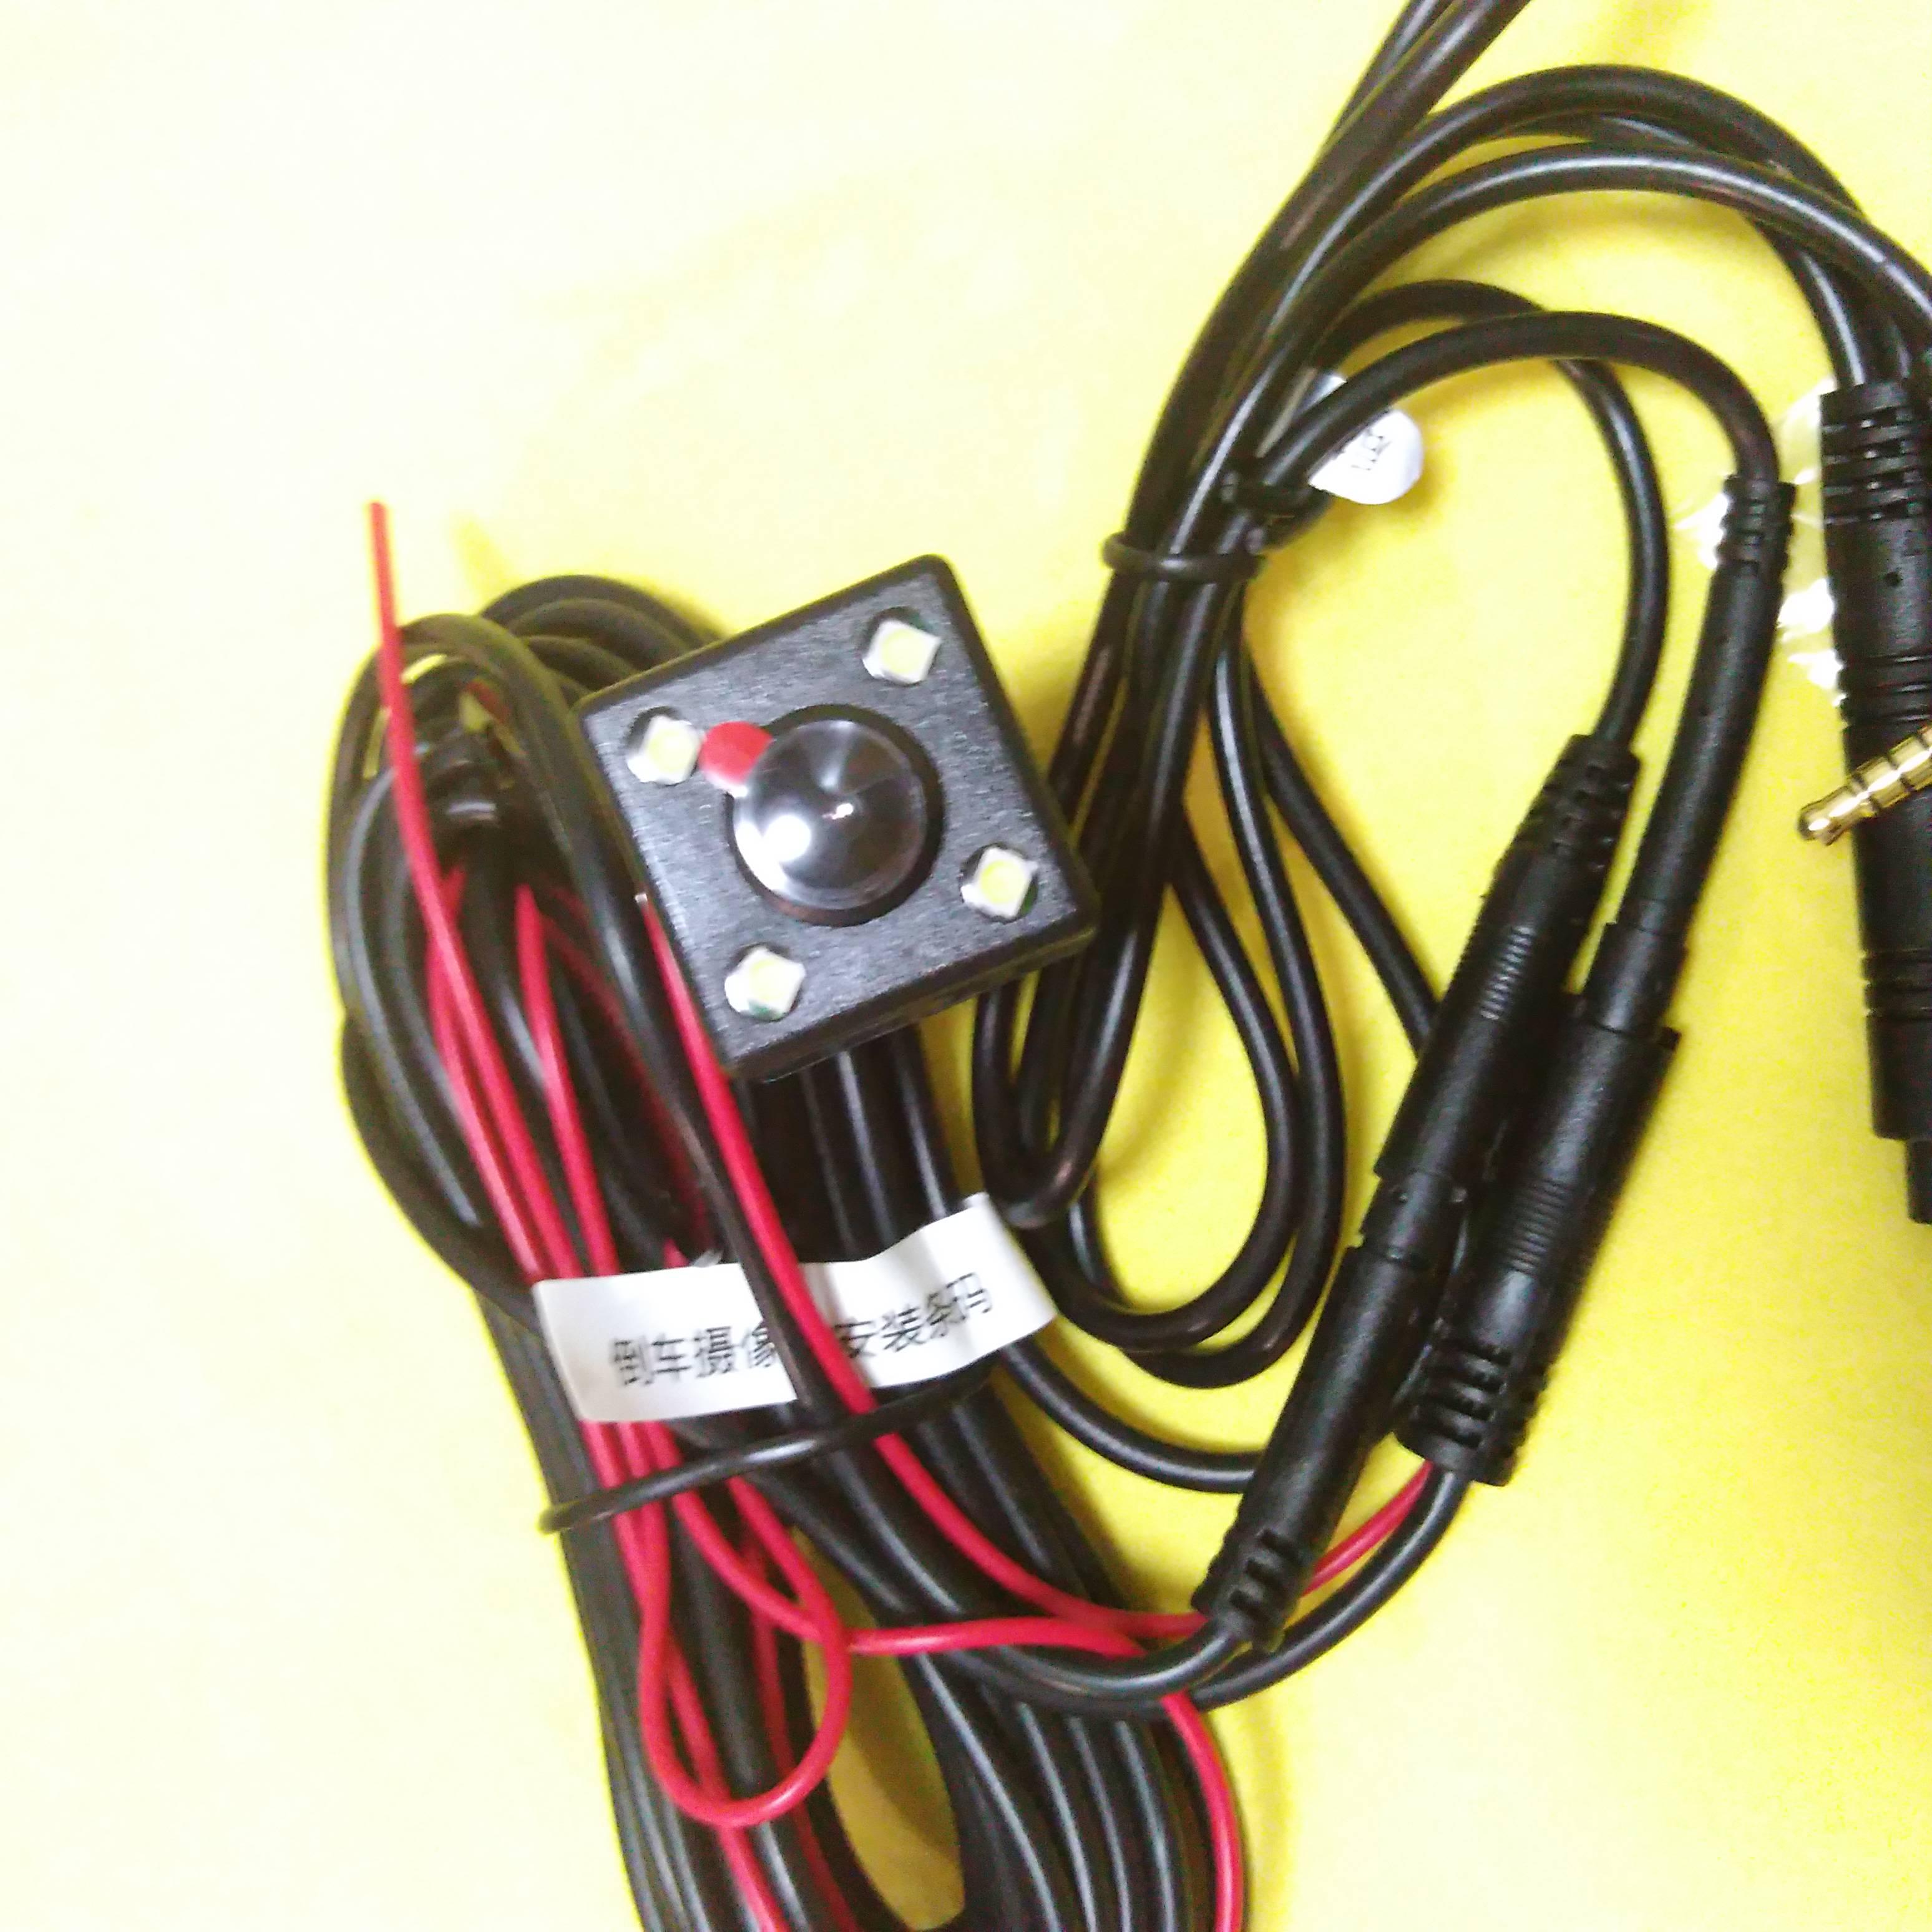 Он Лу Тонг X1 тянет камера Китайский мобильный рекордер R621-1 для задний вид за кормой камера